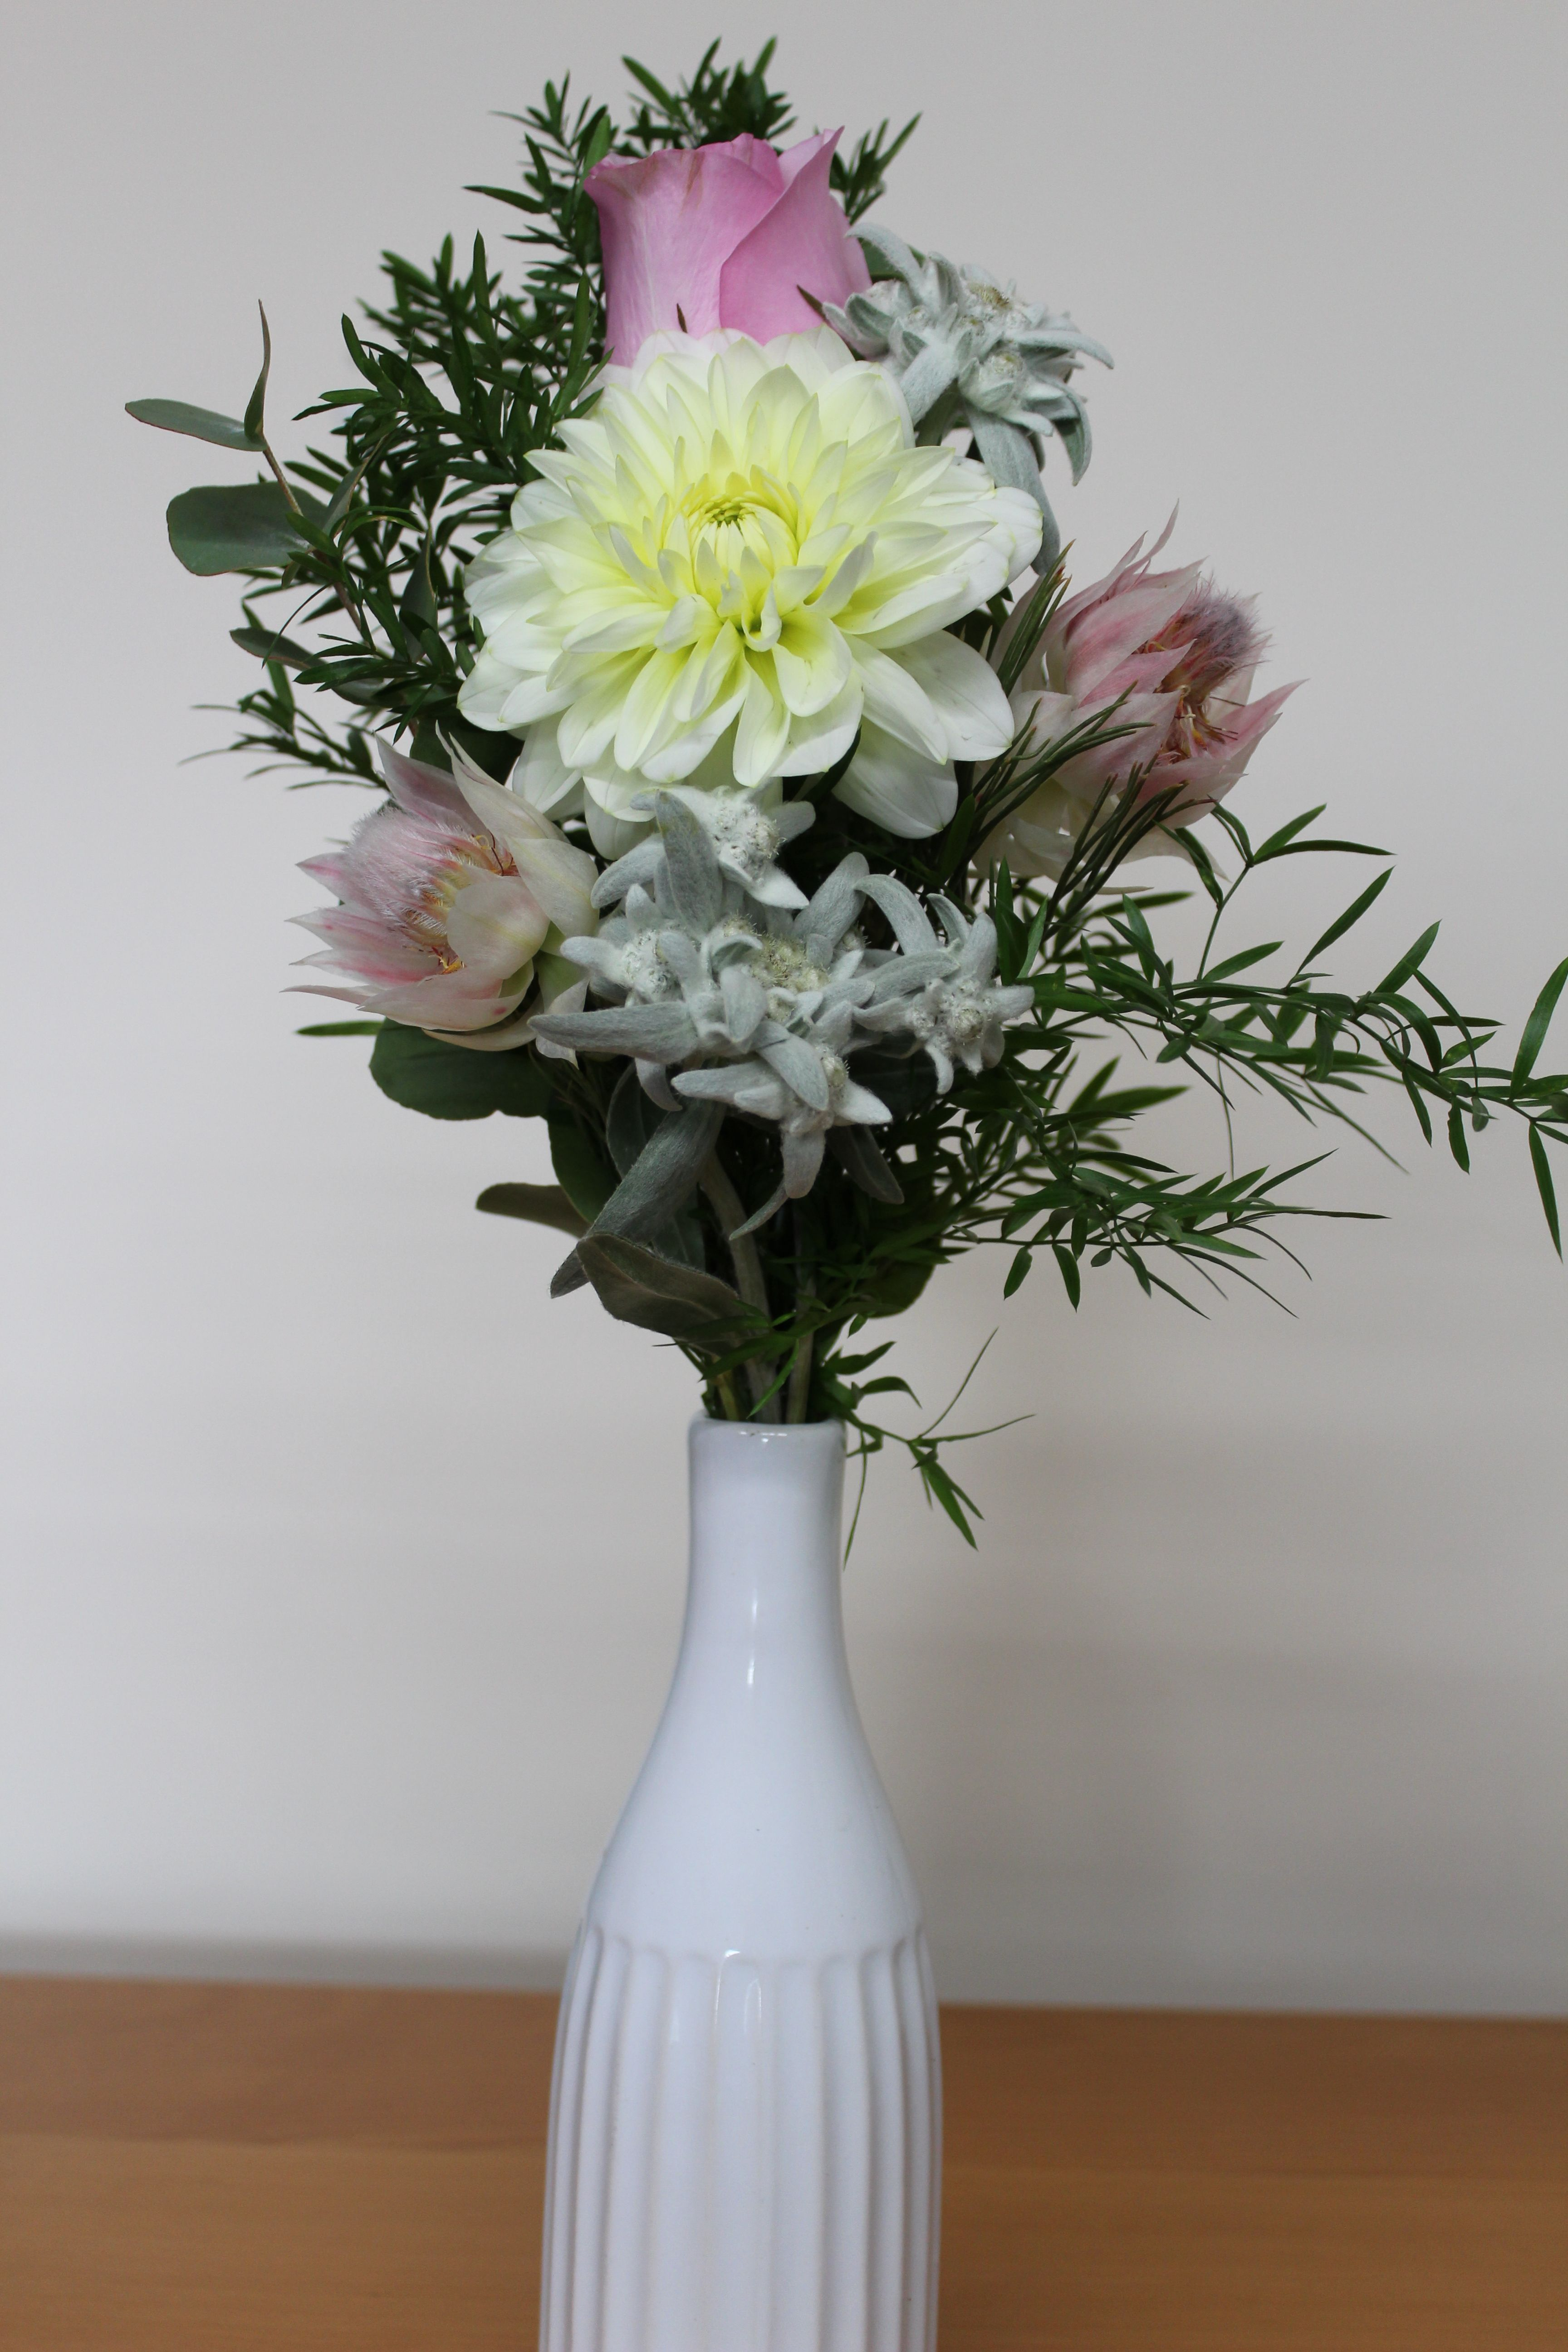 Mothers Day Floral Arrangement In A Ceramic Milk Bottle Style Vase